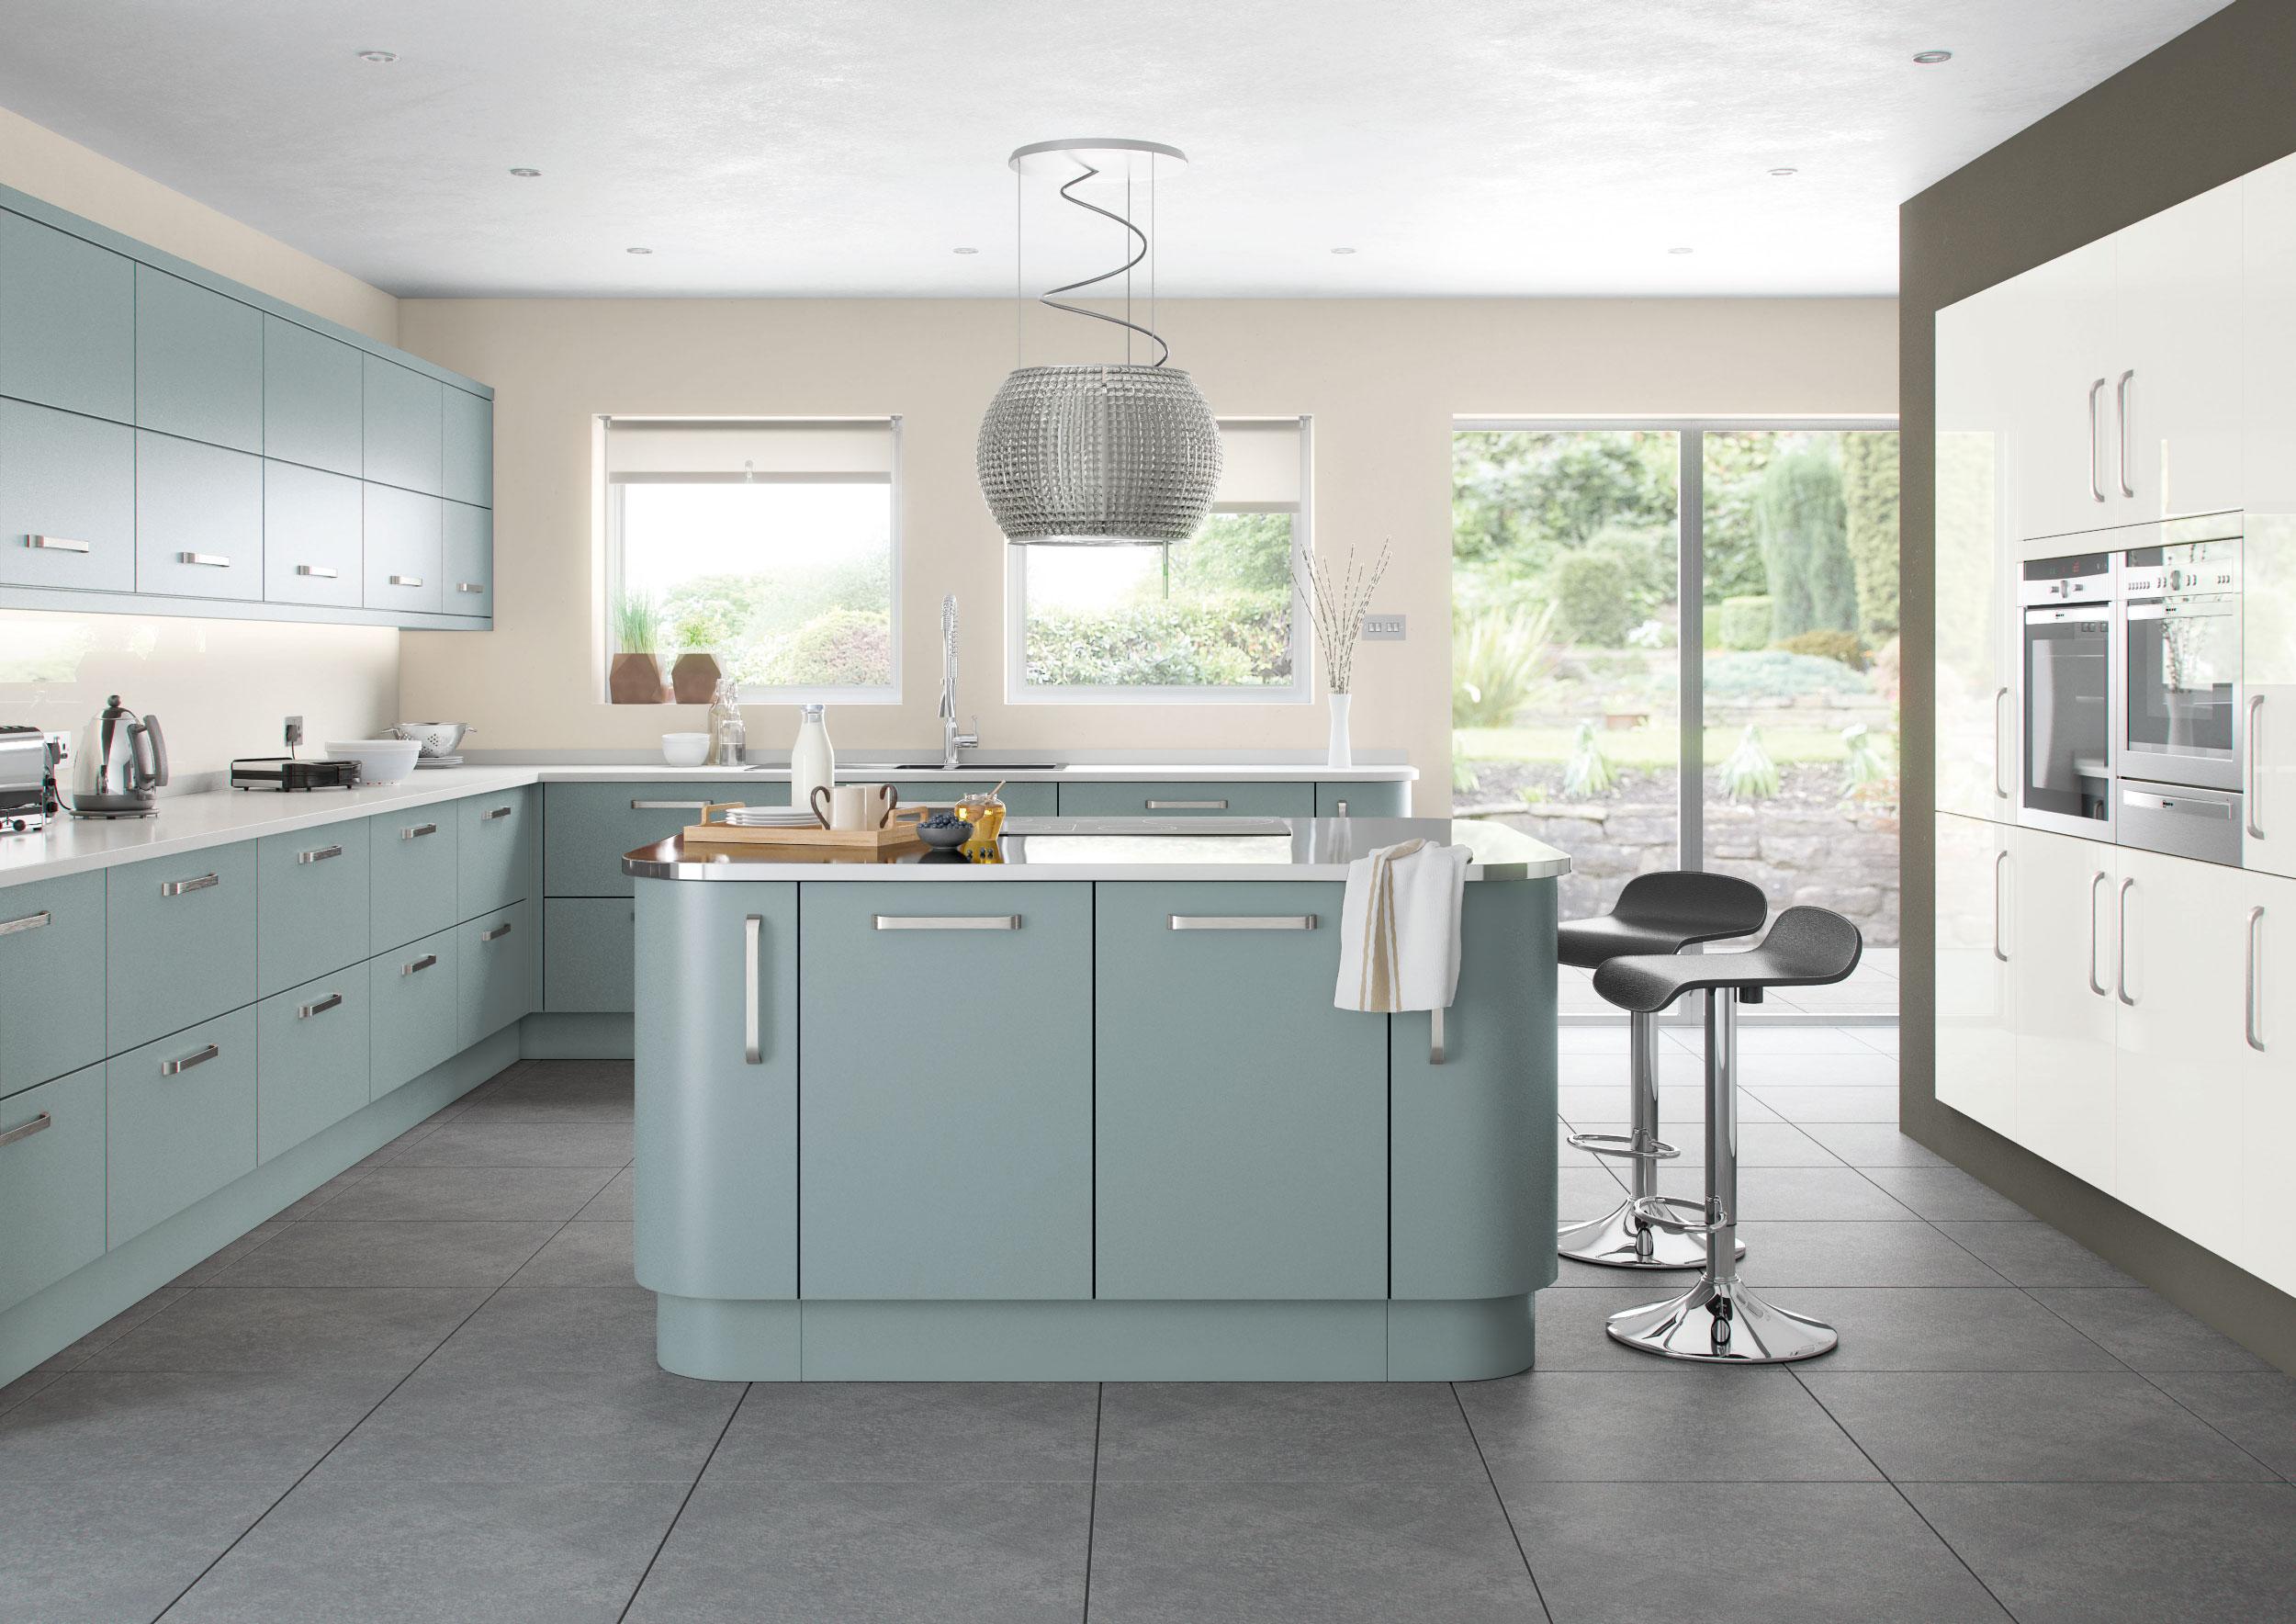 Bespoke Kitchen Cabinet Manufacturer